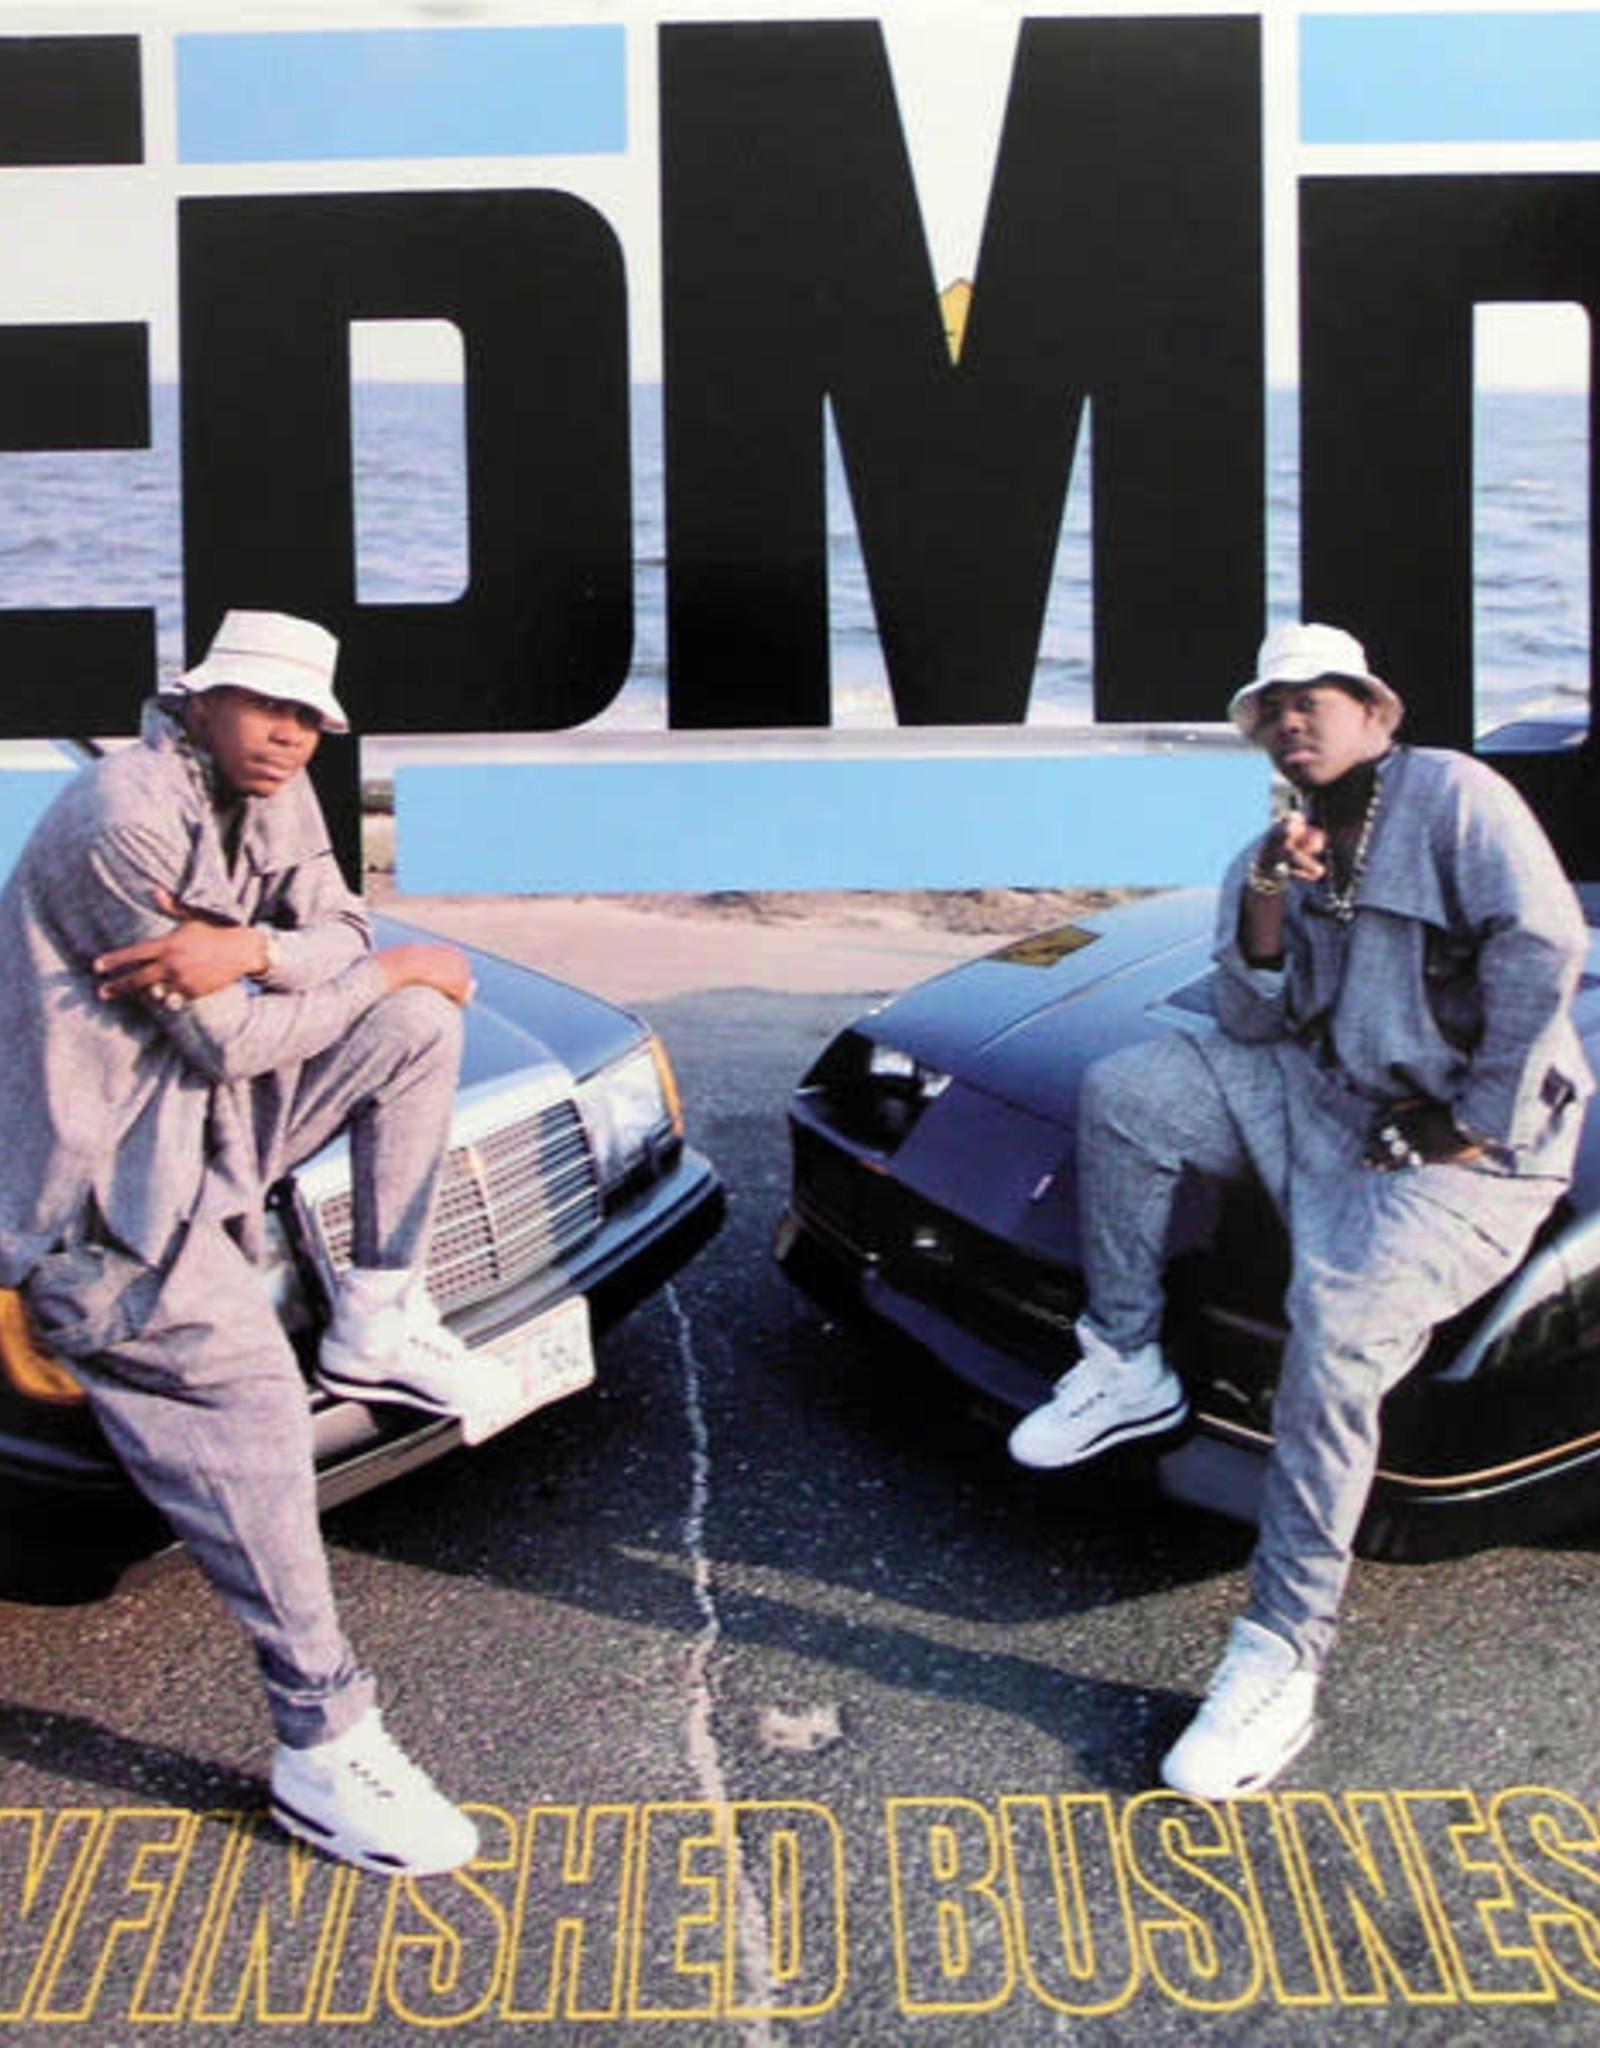 Epmd - Unfinished Business